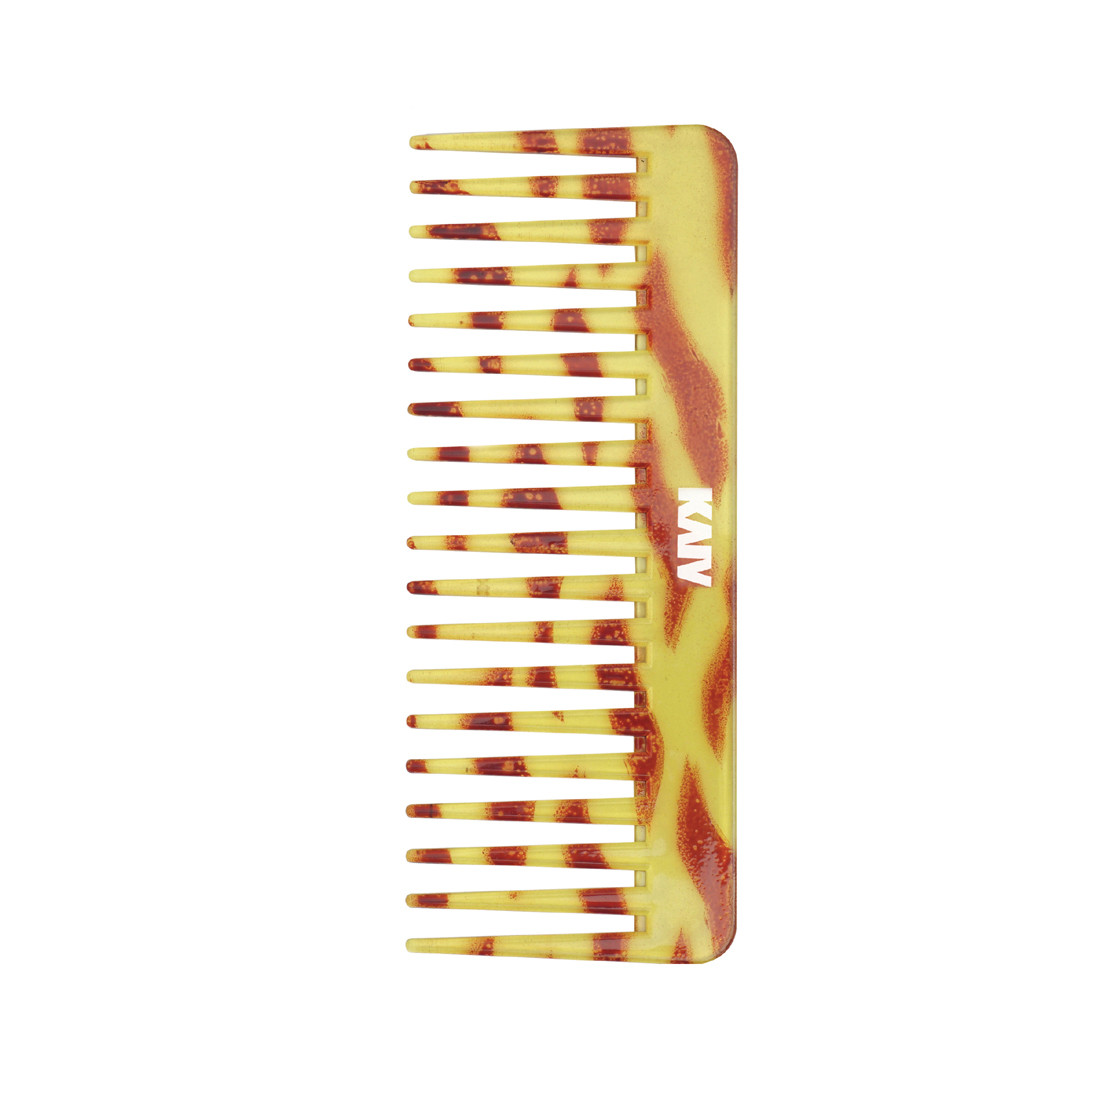 Kaiv Shampoo Comb